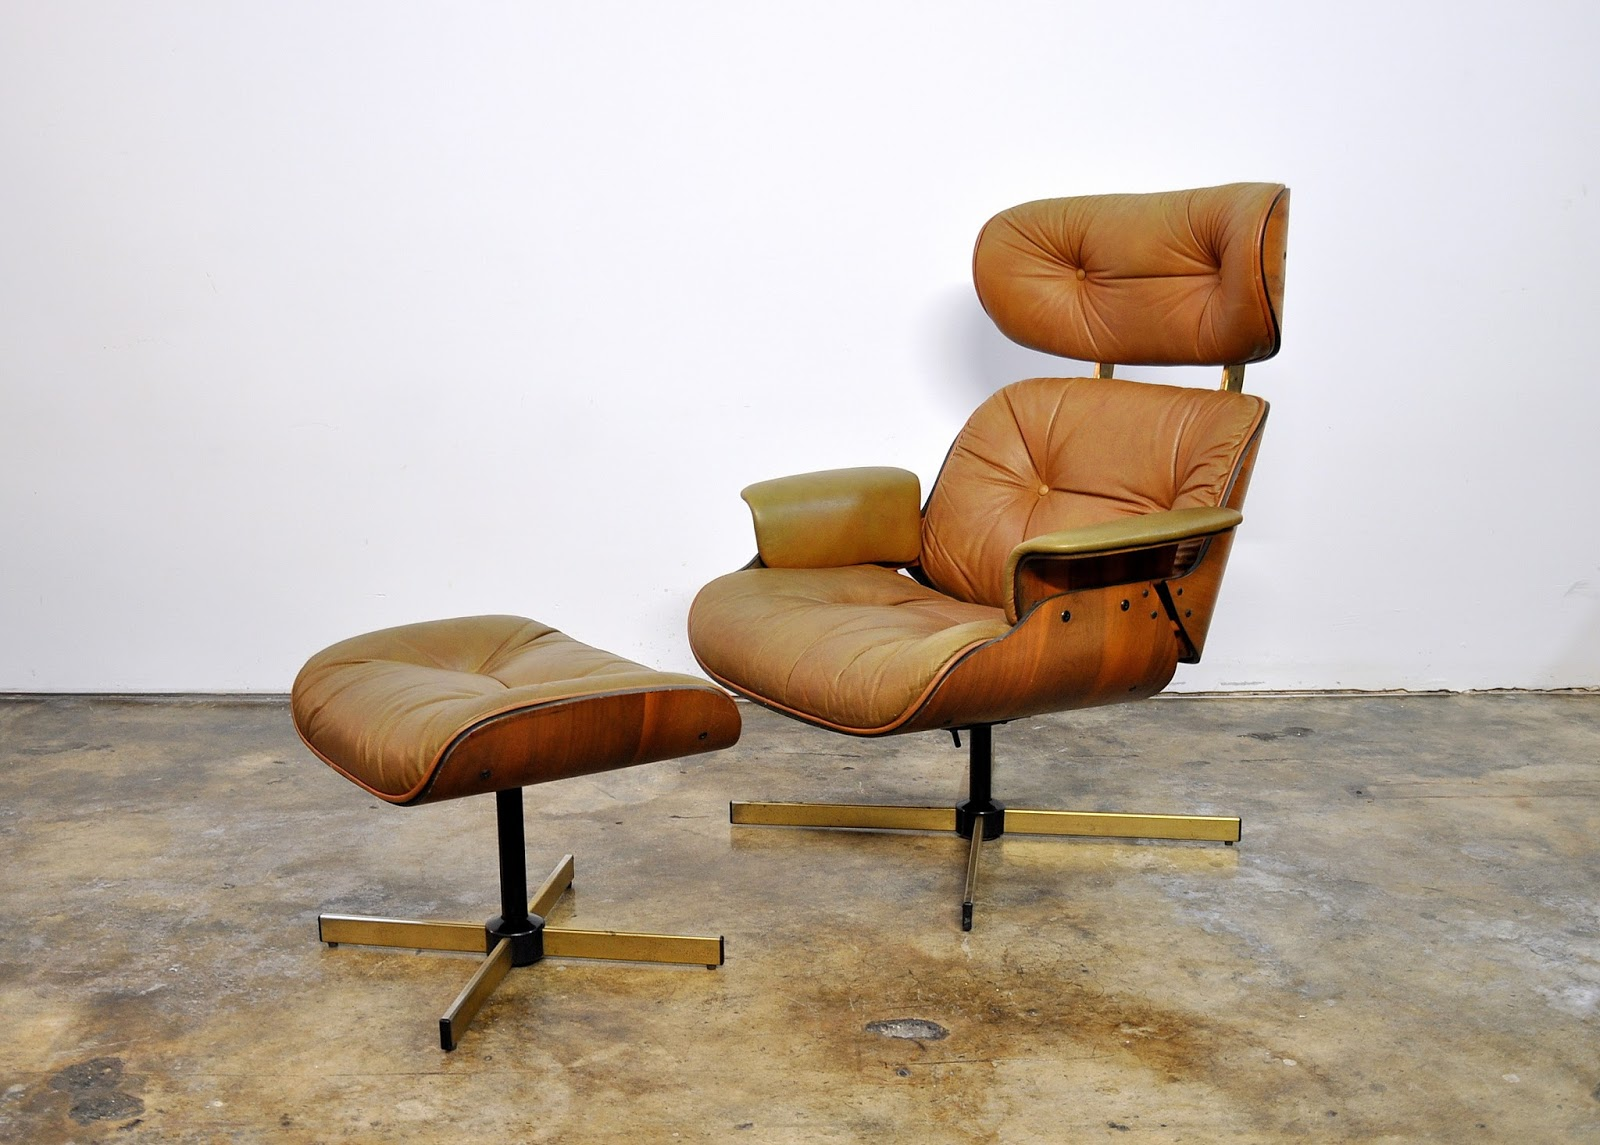 selig eames chair wheelchair express select modern september 2015